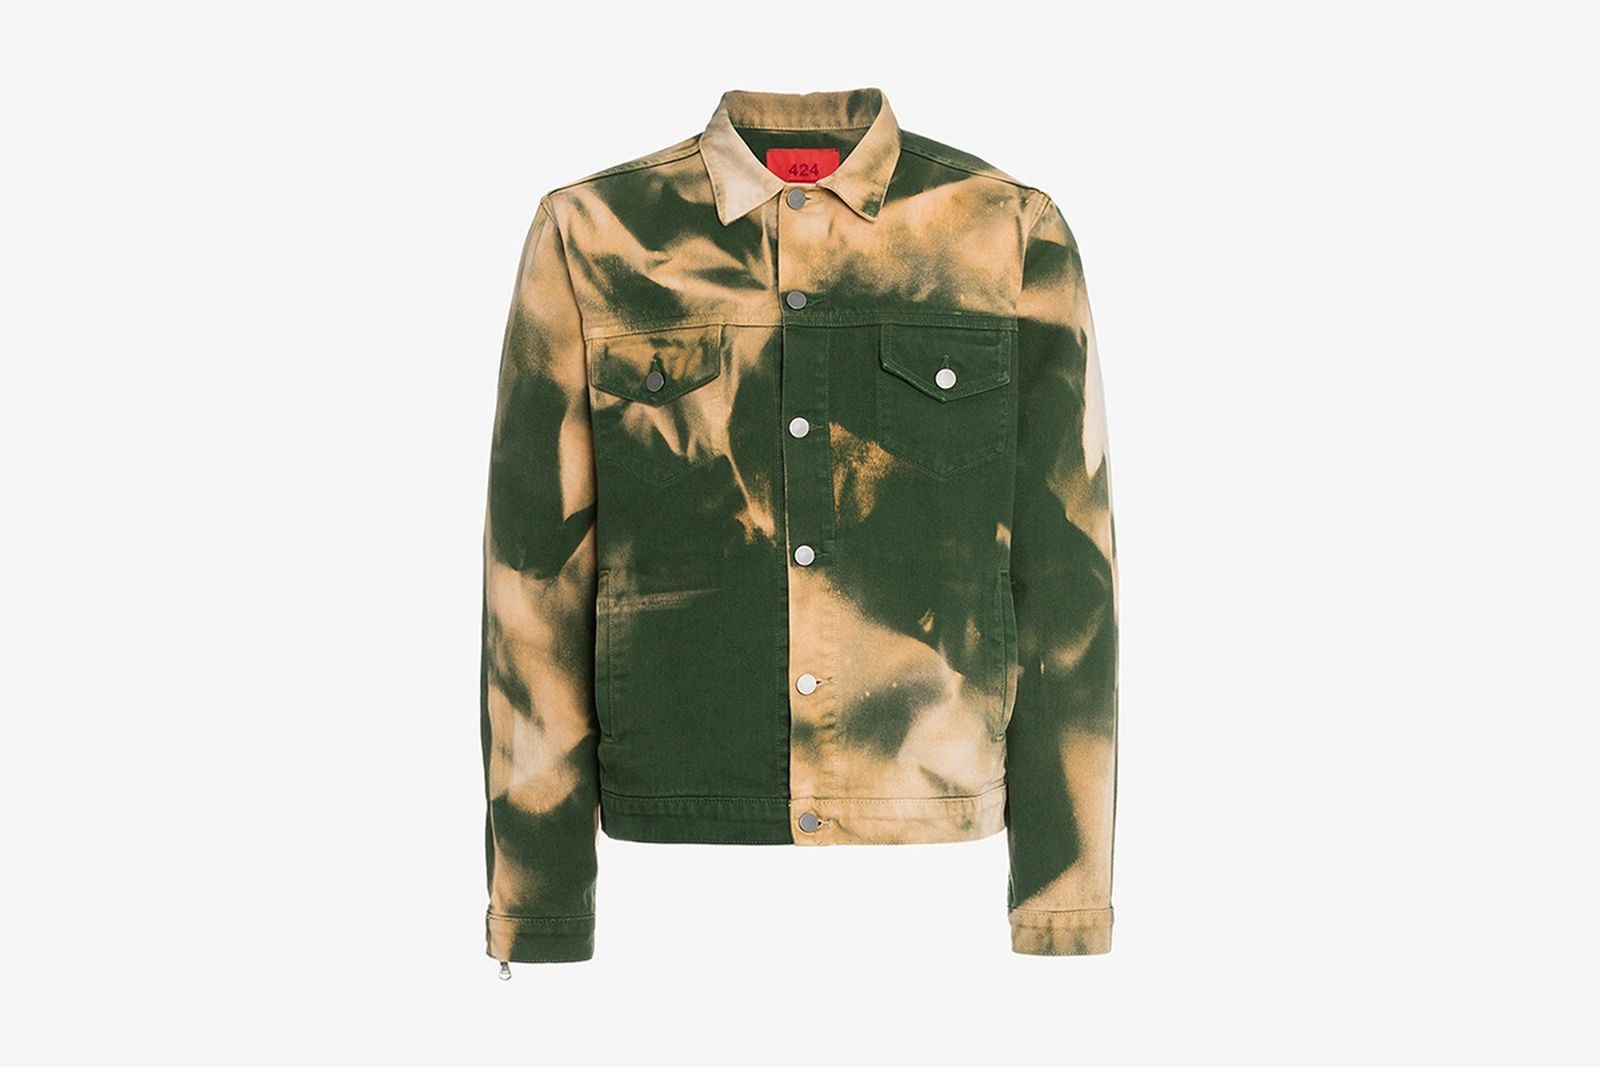 Browns Fashion 424 Fairfax X Armes Bleach Denim Jacket tie dye